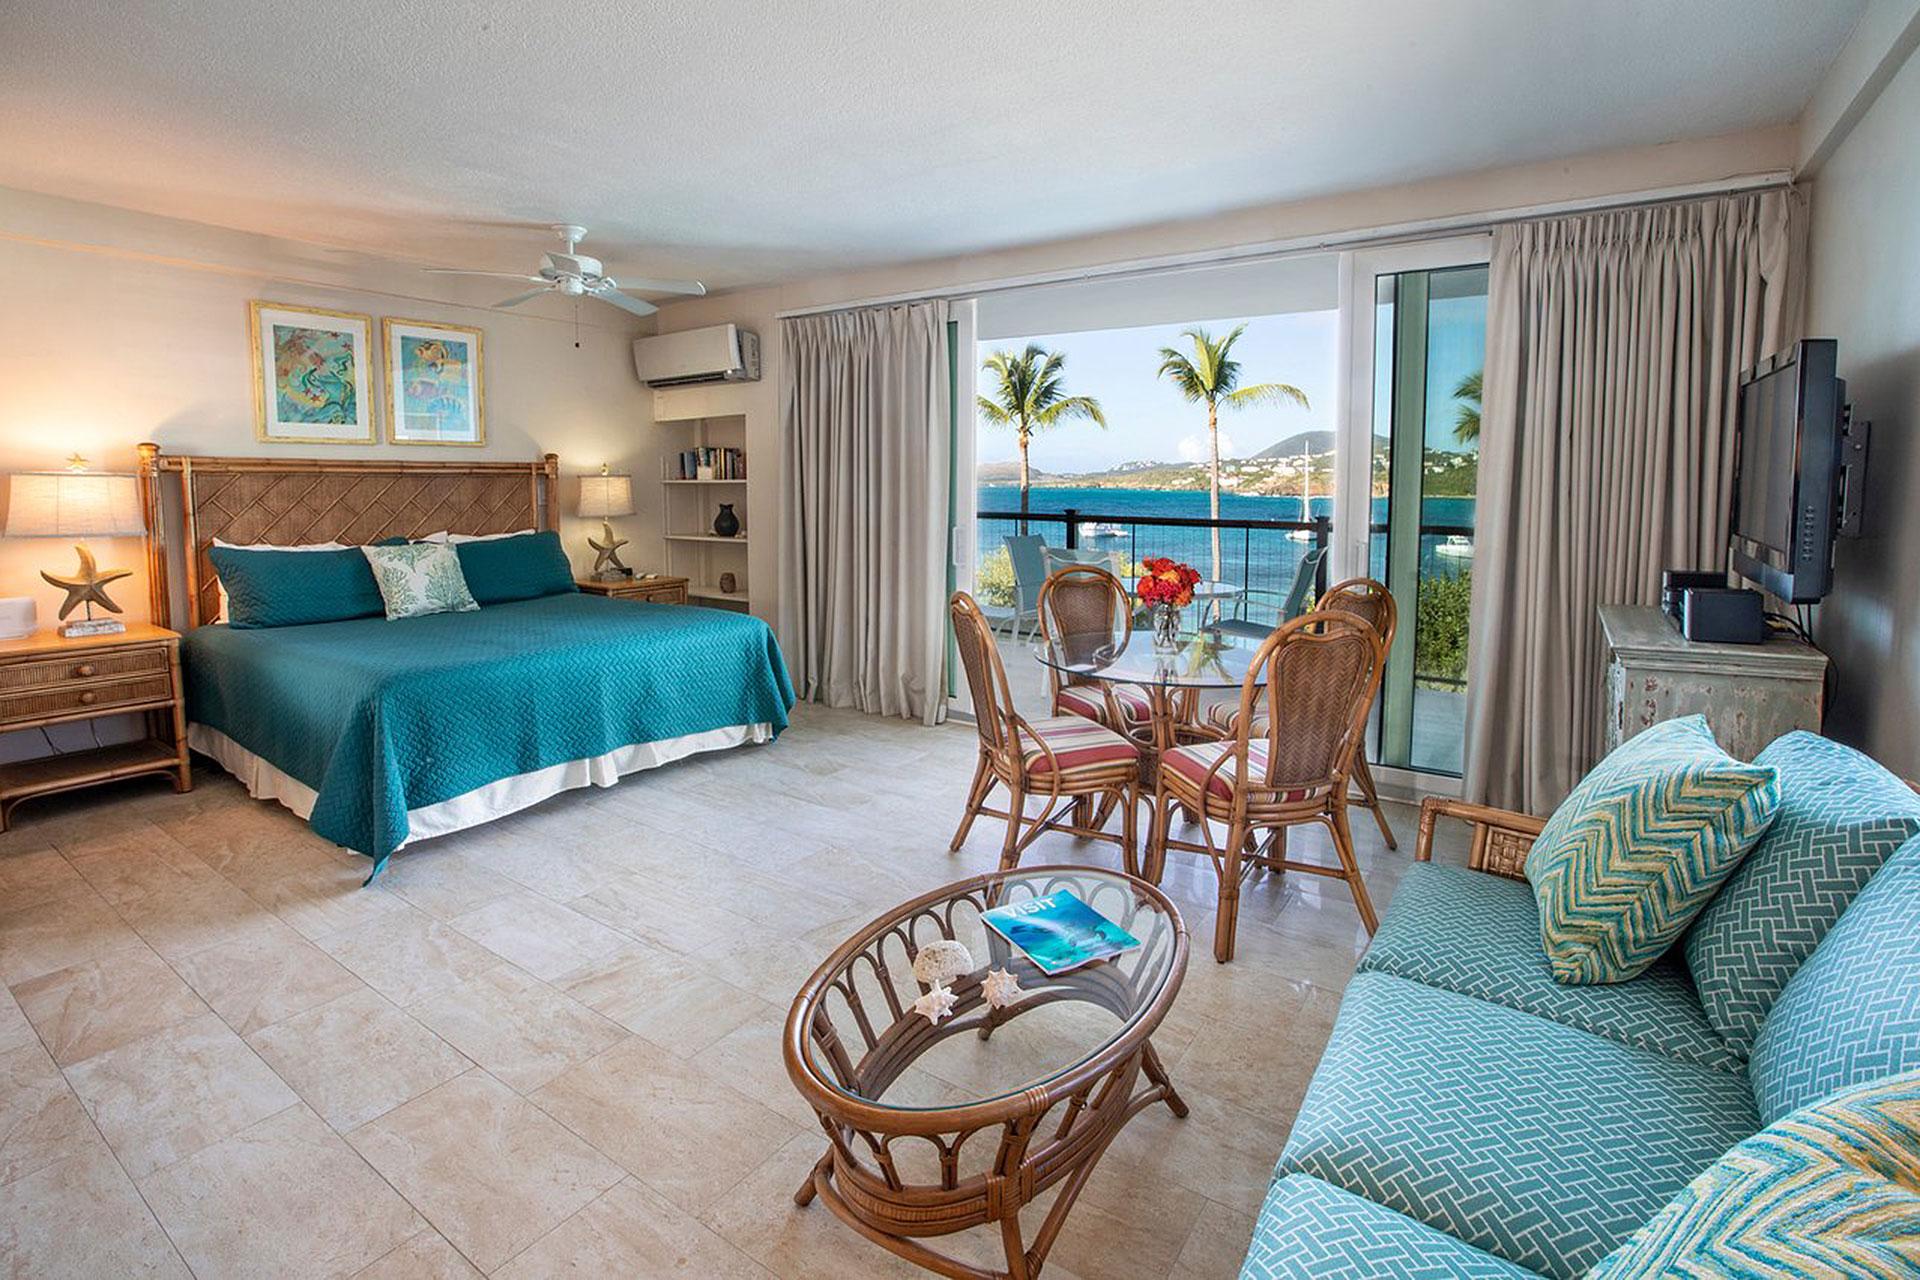 Secret Harbour Beach Resort in St. Thomas; Courtesy of Secret Harbour Beach Resort